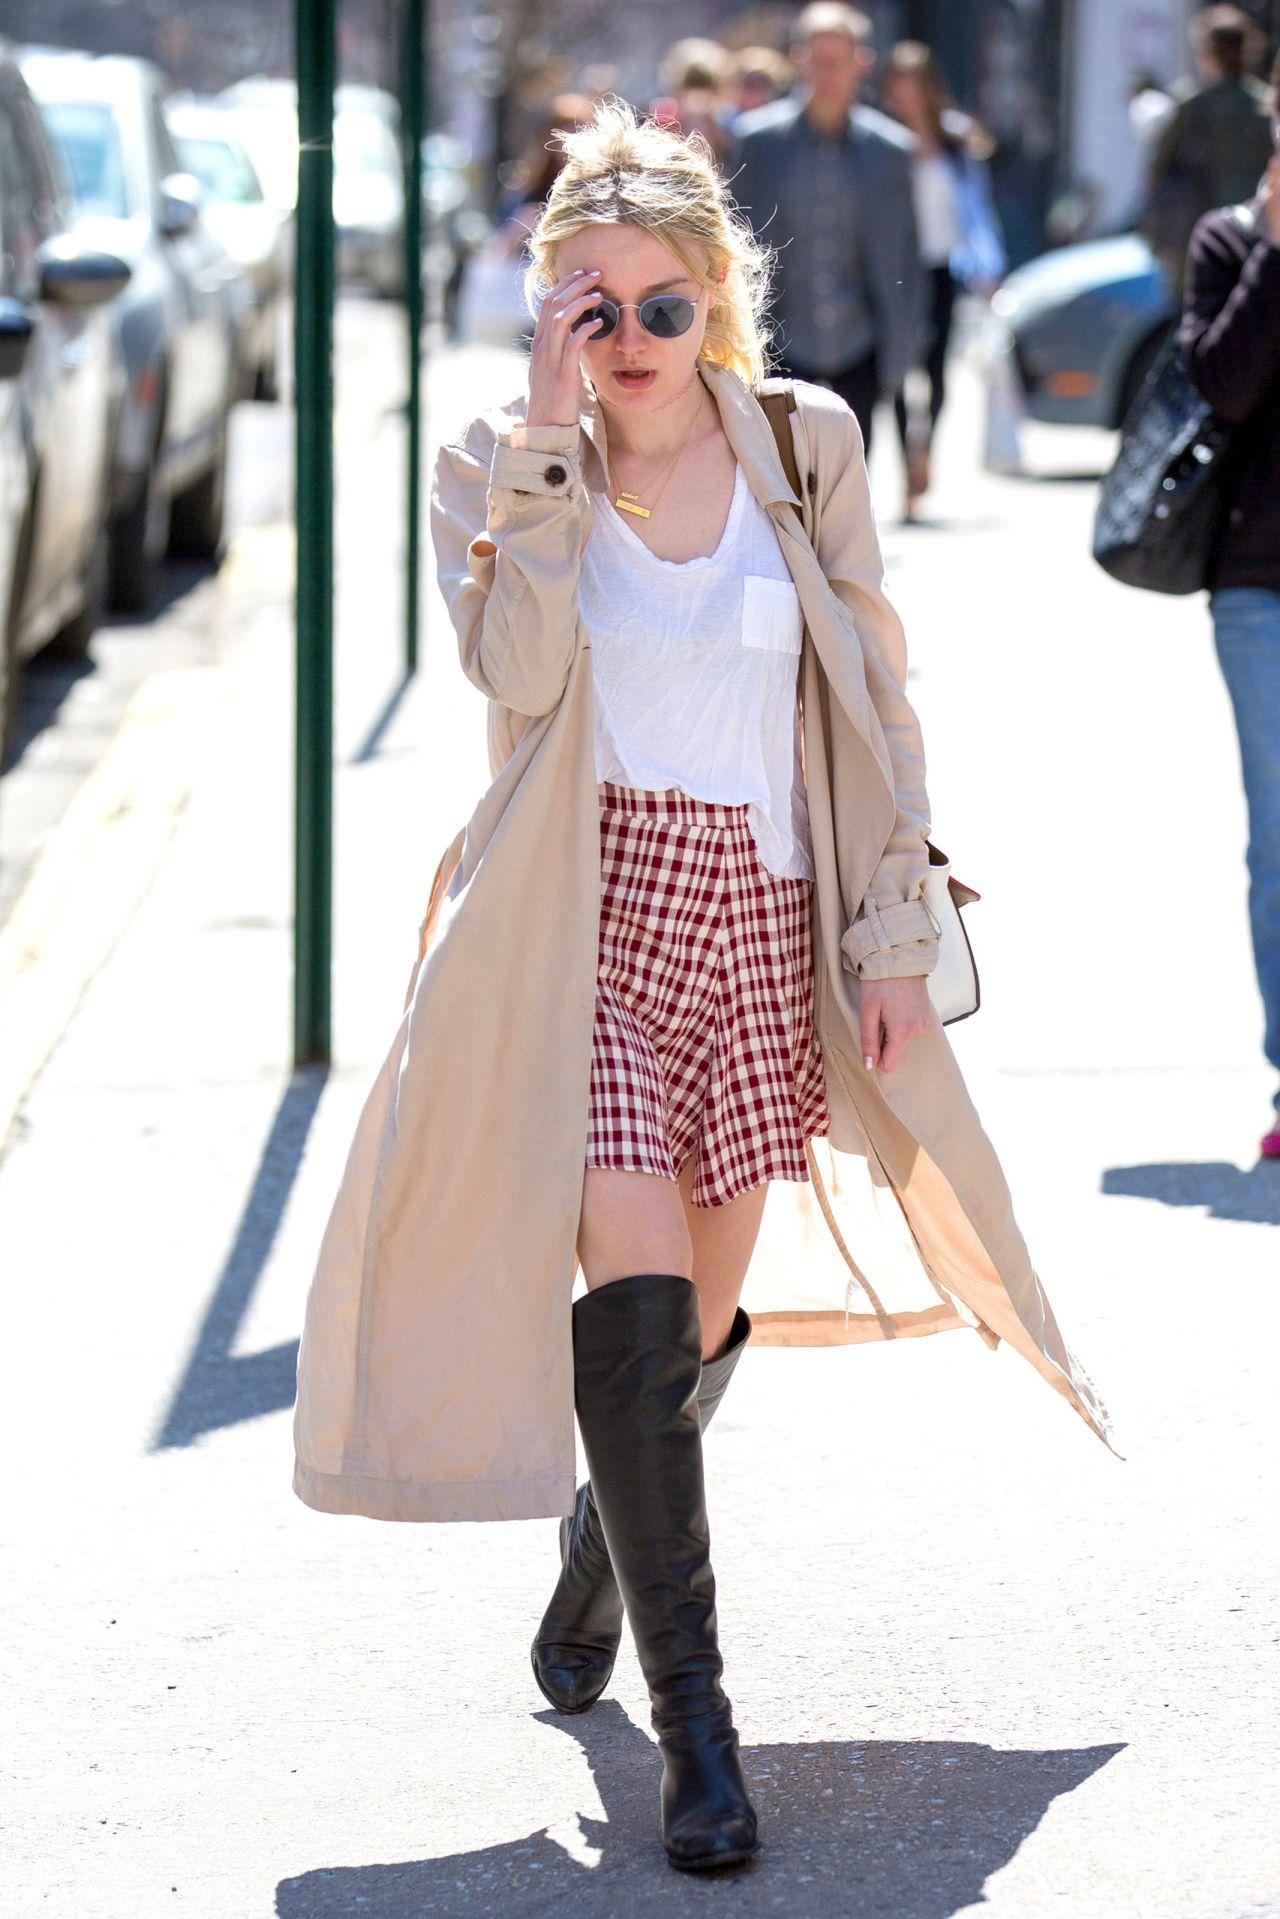 Dakota Fanning Street Fashion - Out in NYC, April 2015